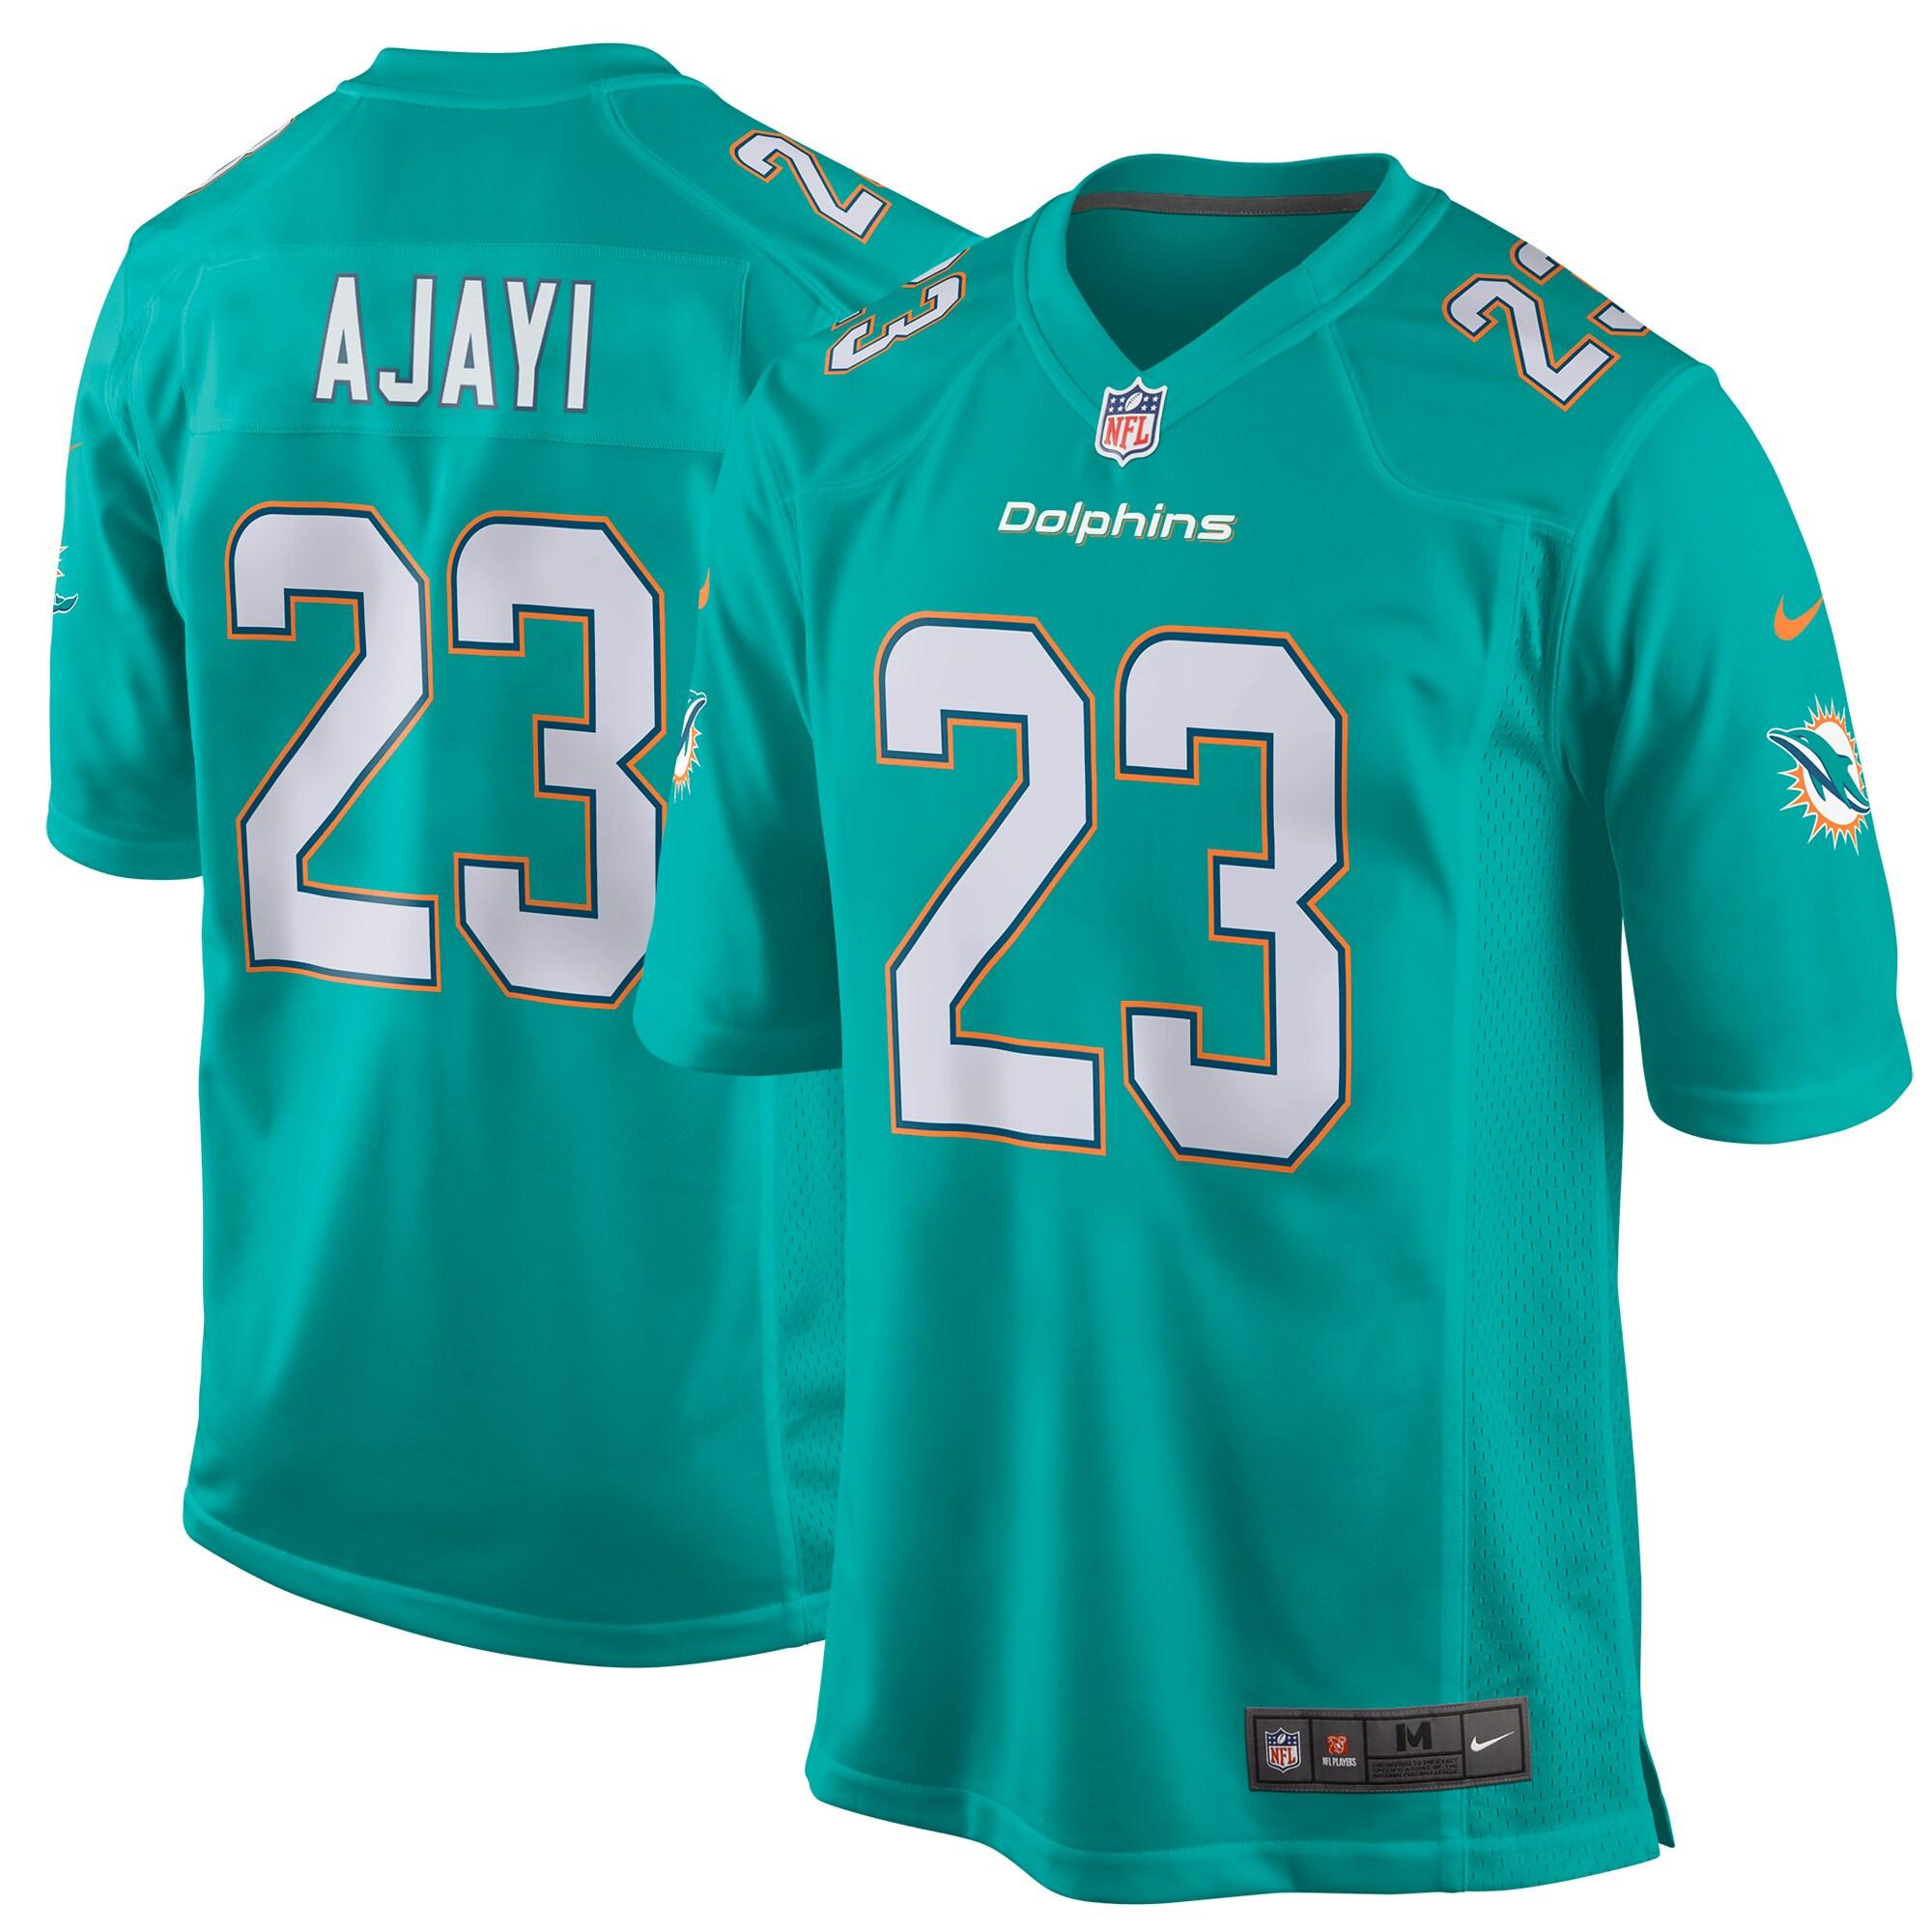 Jay Ajayi Miami Dolphins Nike Youth Game Jersey - Aqua